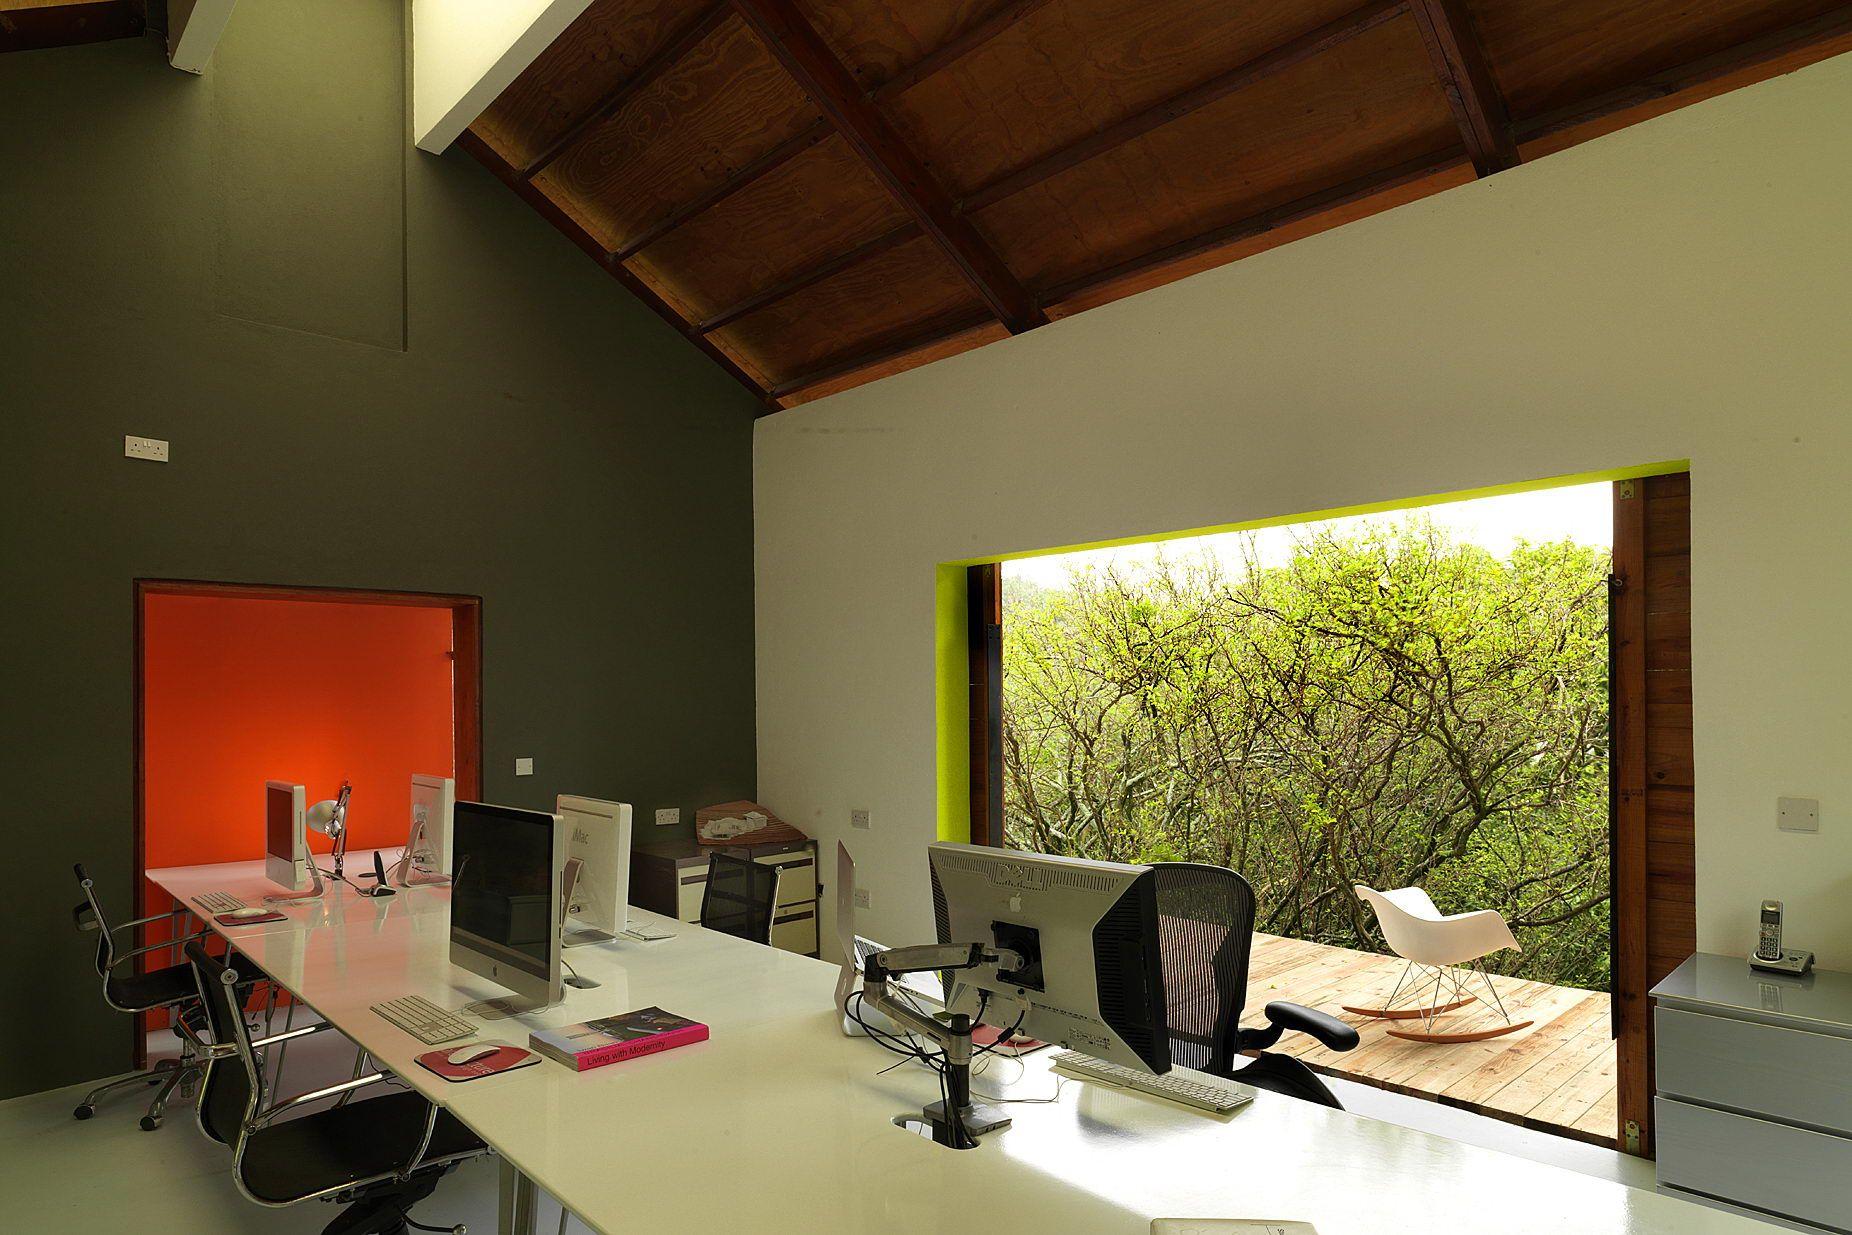 Modern Architecture Office Interior paul raff studio | office | workspace | pinterest | studio